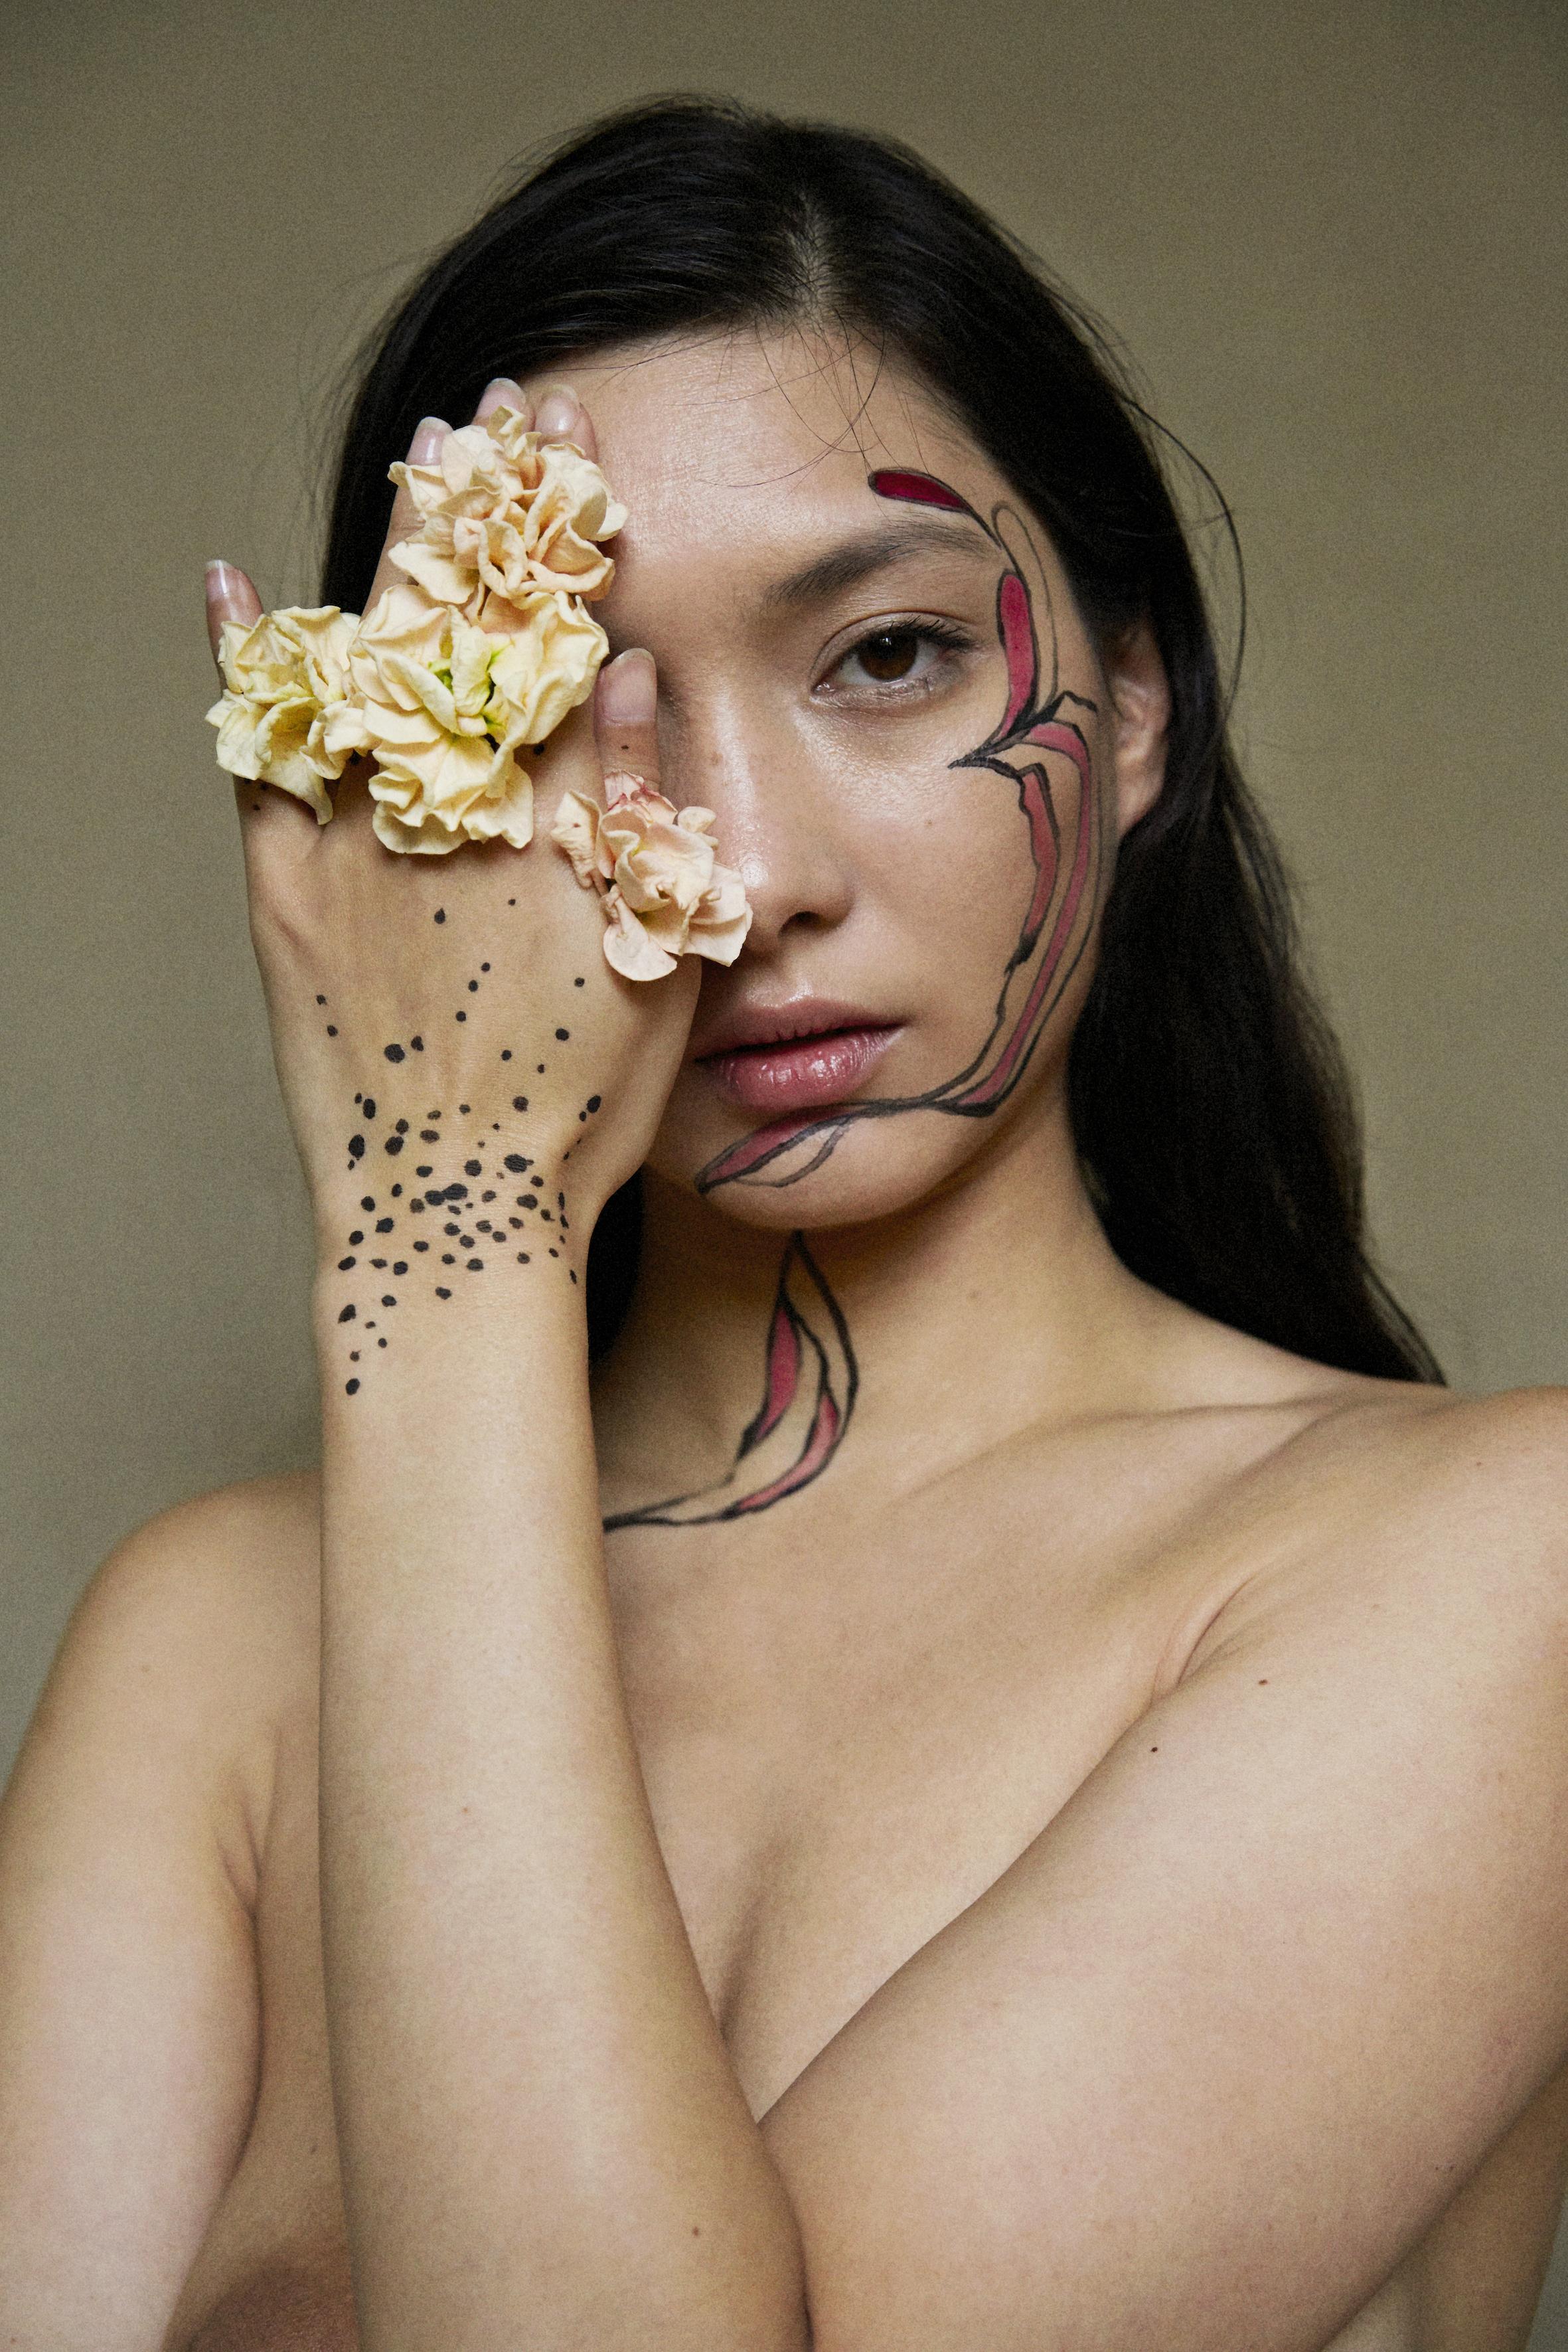 icon-artist-management-kristin-vicari-commission-absolution-cosmetics-014.jpg